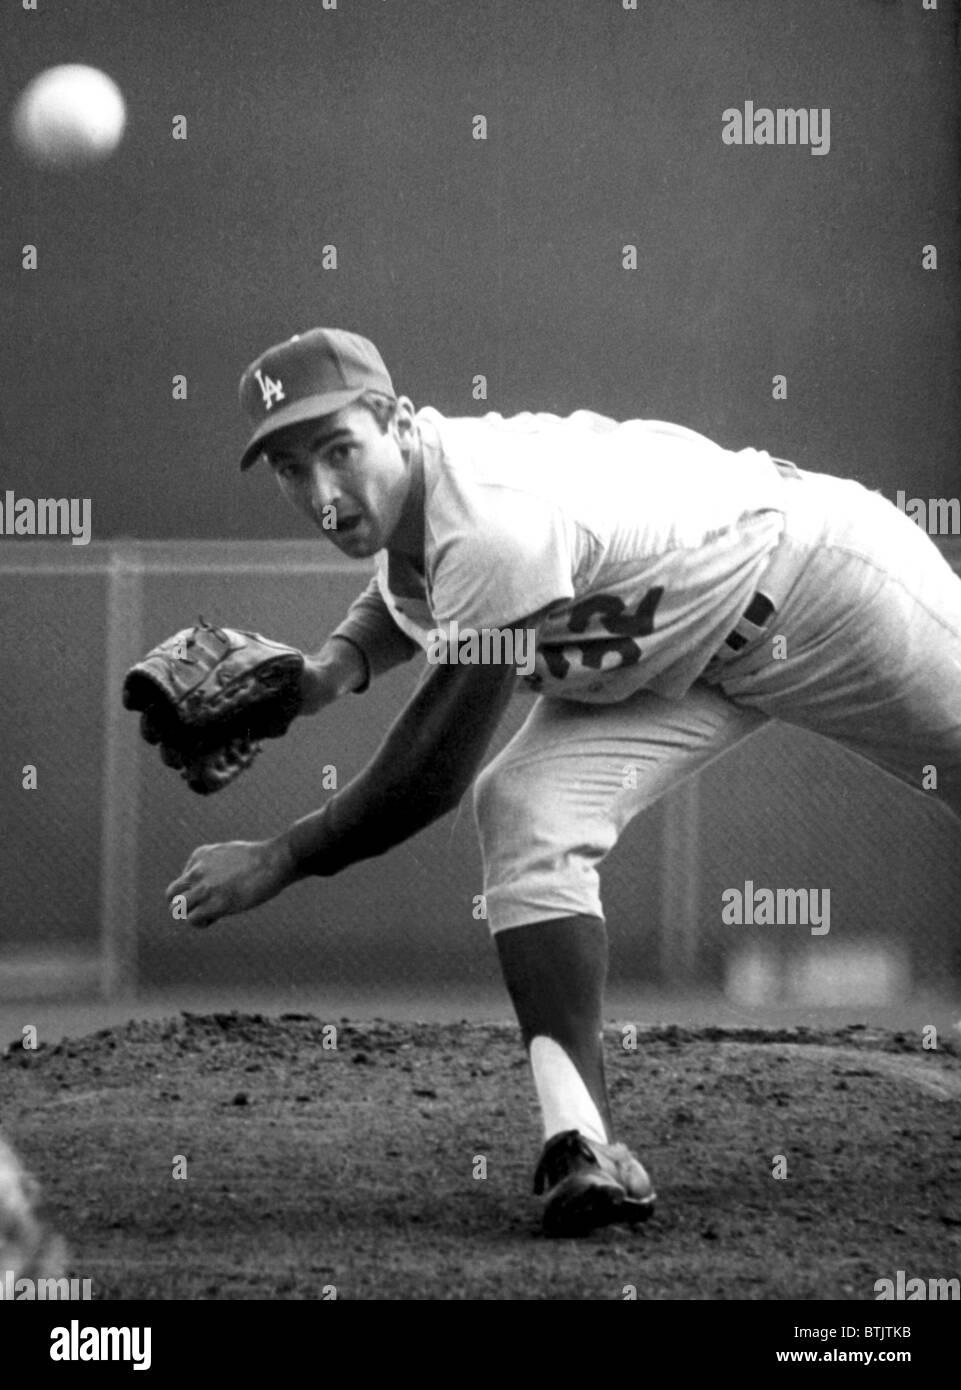 L.A. Dodgers pitcher SANDY KOUFAX, 1965 Stock Photo